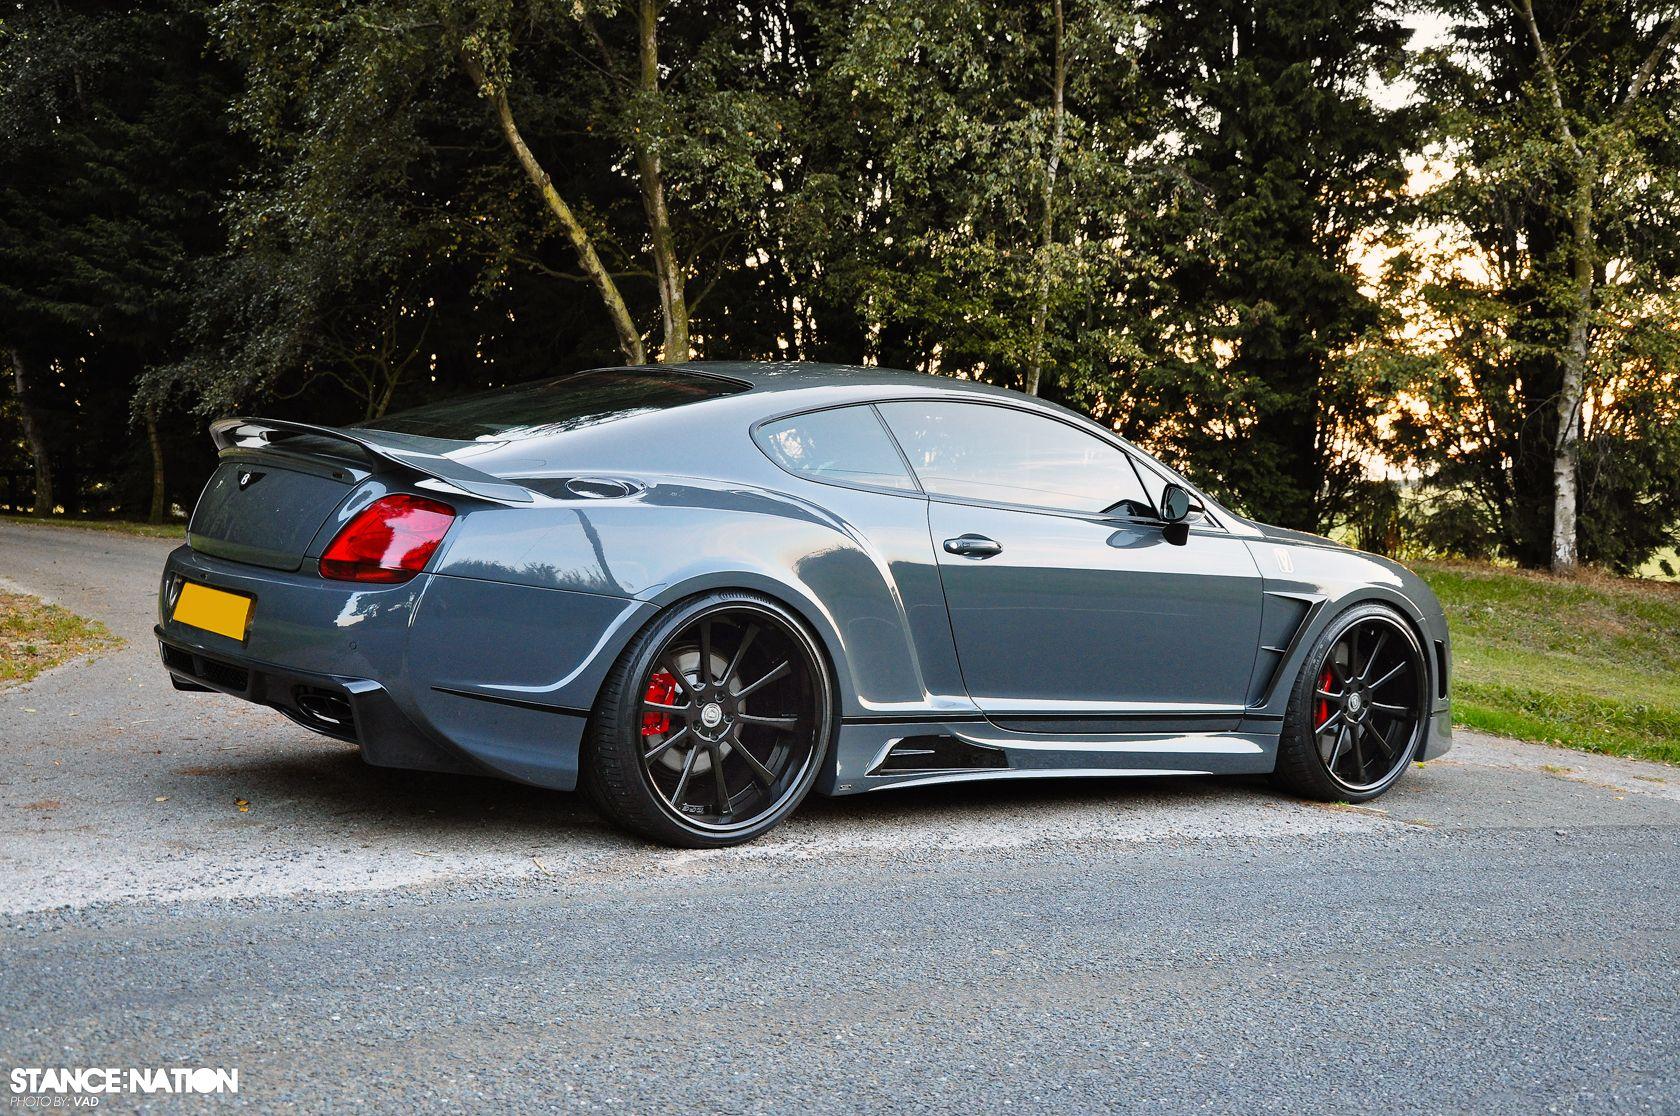 Pin By Dexter Griffin On Adrenaline Capsules Bentley Gt Coupe Bentley Gt Bentley Continental Gt